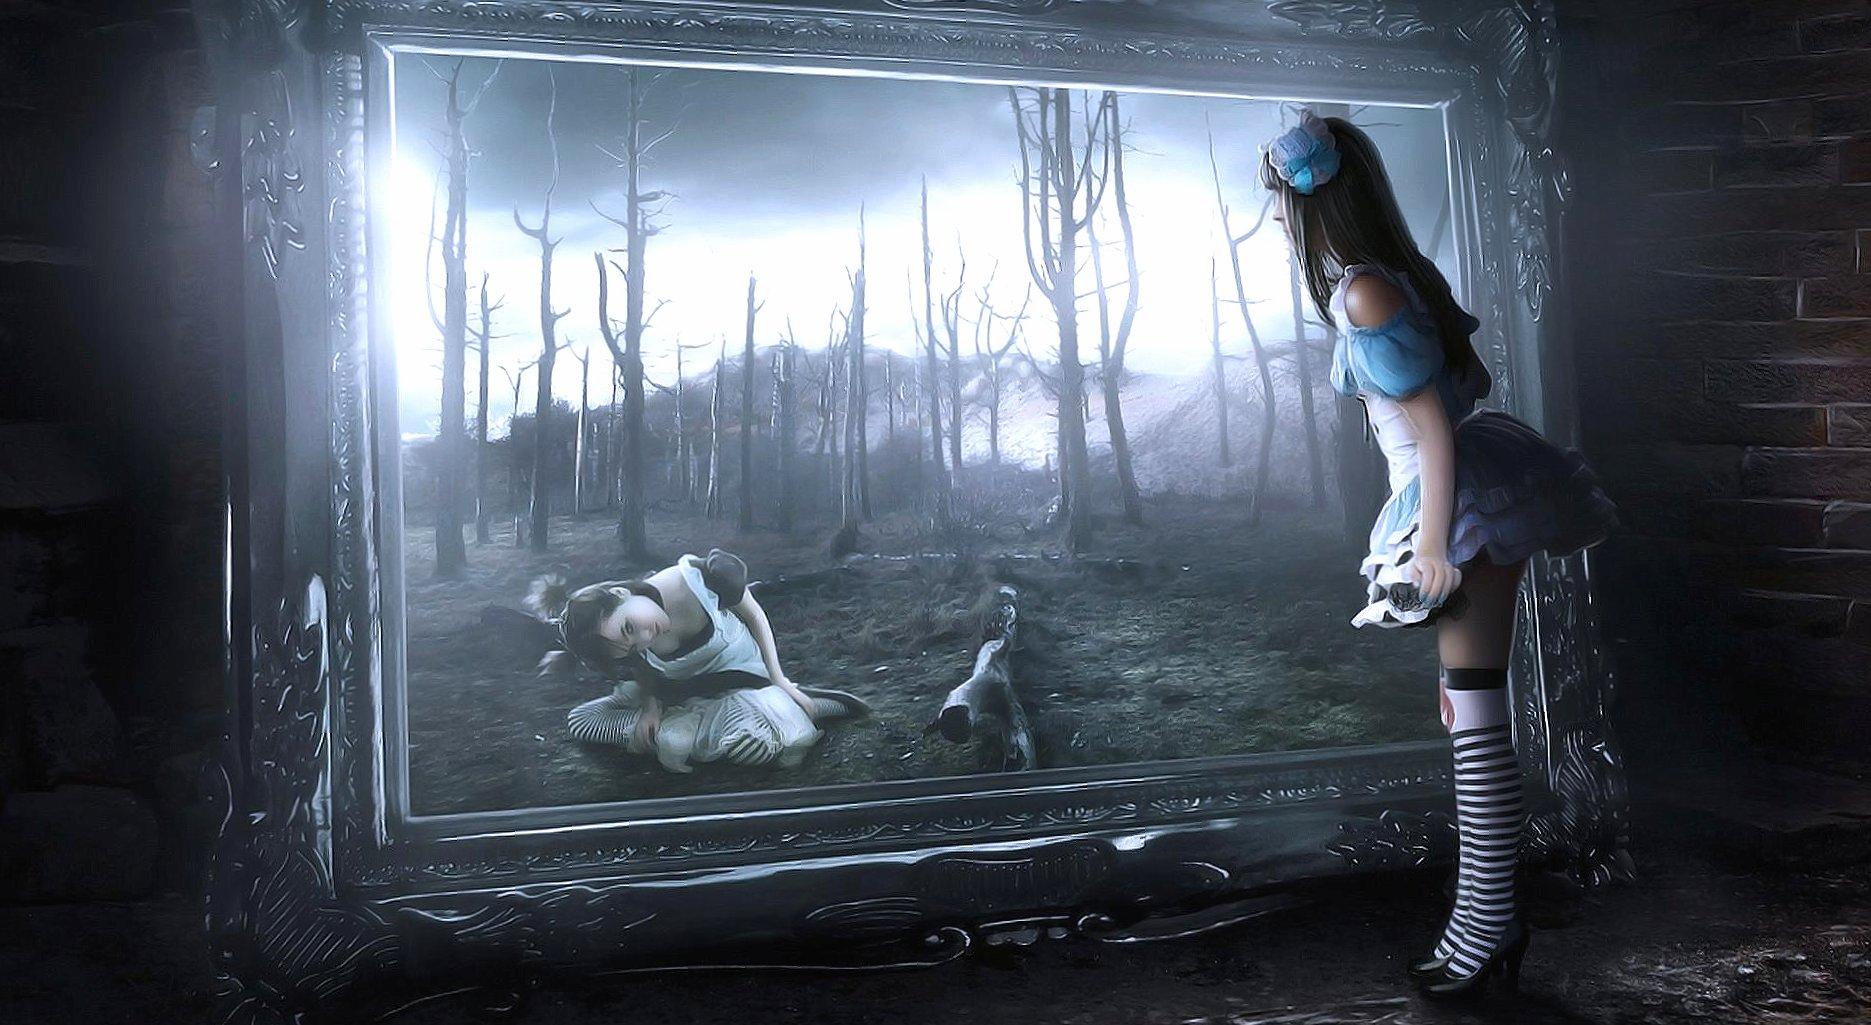 Alice mirror wonderland digital art wallpapers HD quality